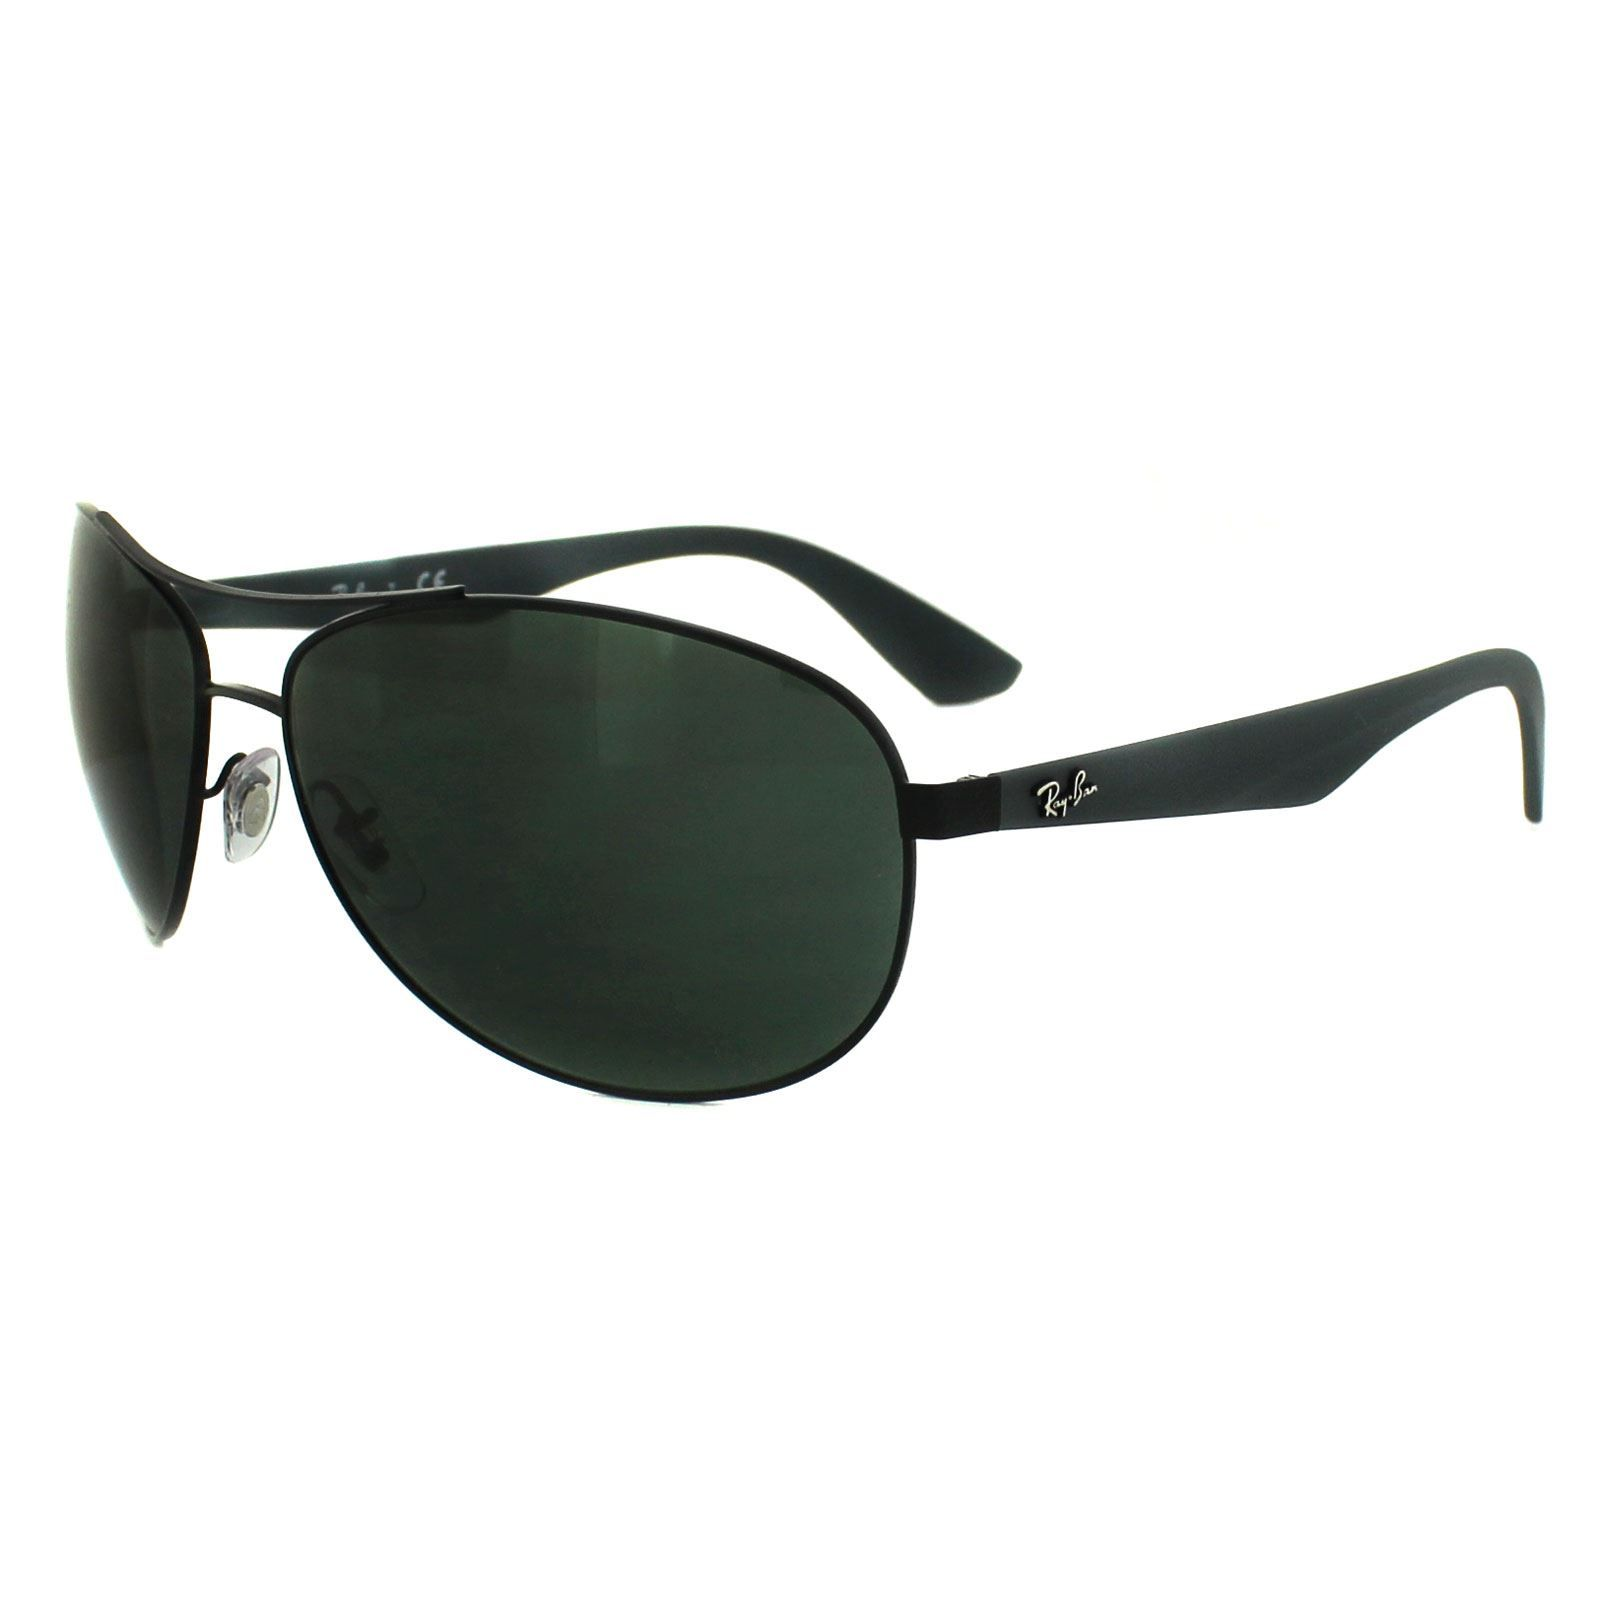 Ray-Ban Sunglasses 3526 006/71 Matt Black Grey Green